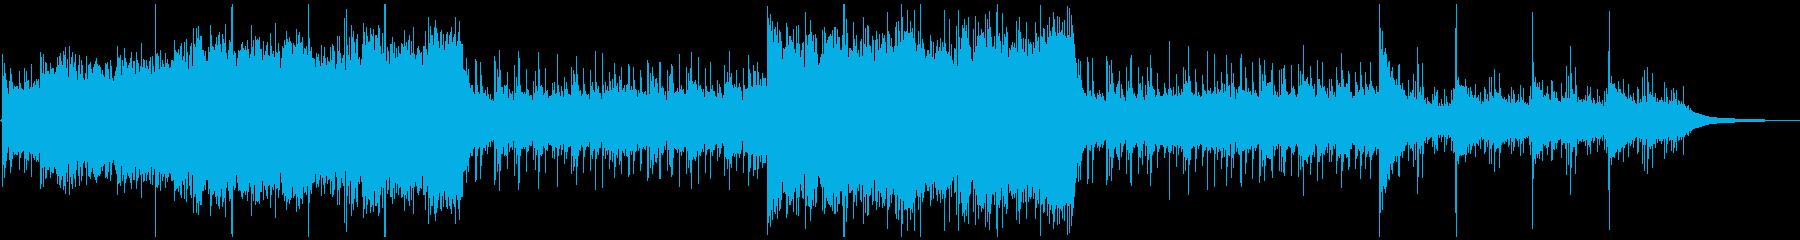 Emotional Cinematic Sad Violin and Piano's reproduced waveform